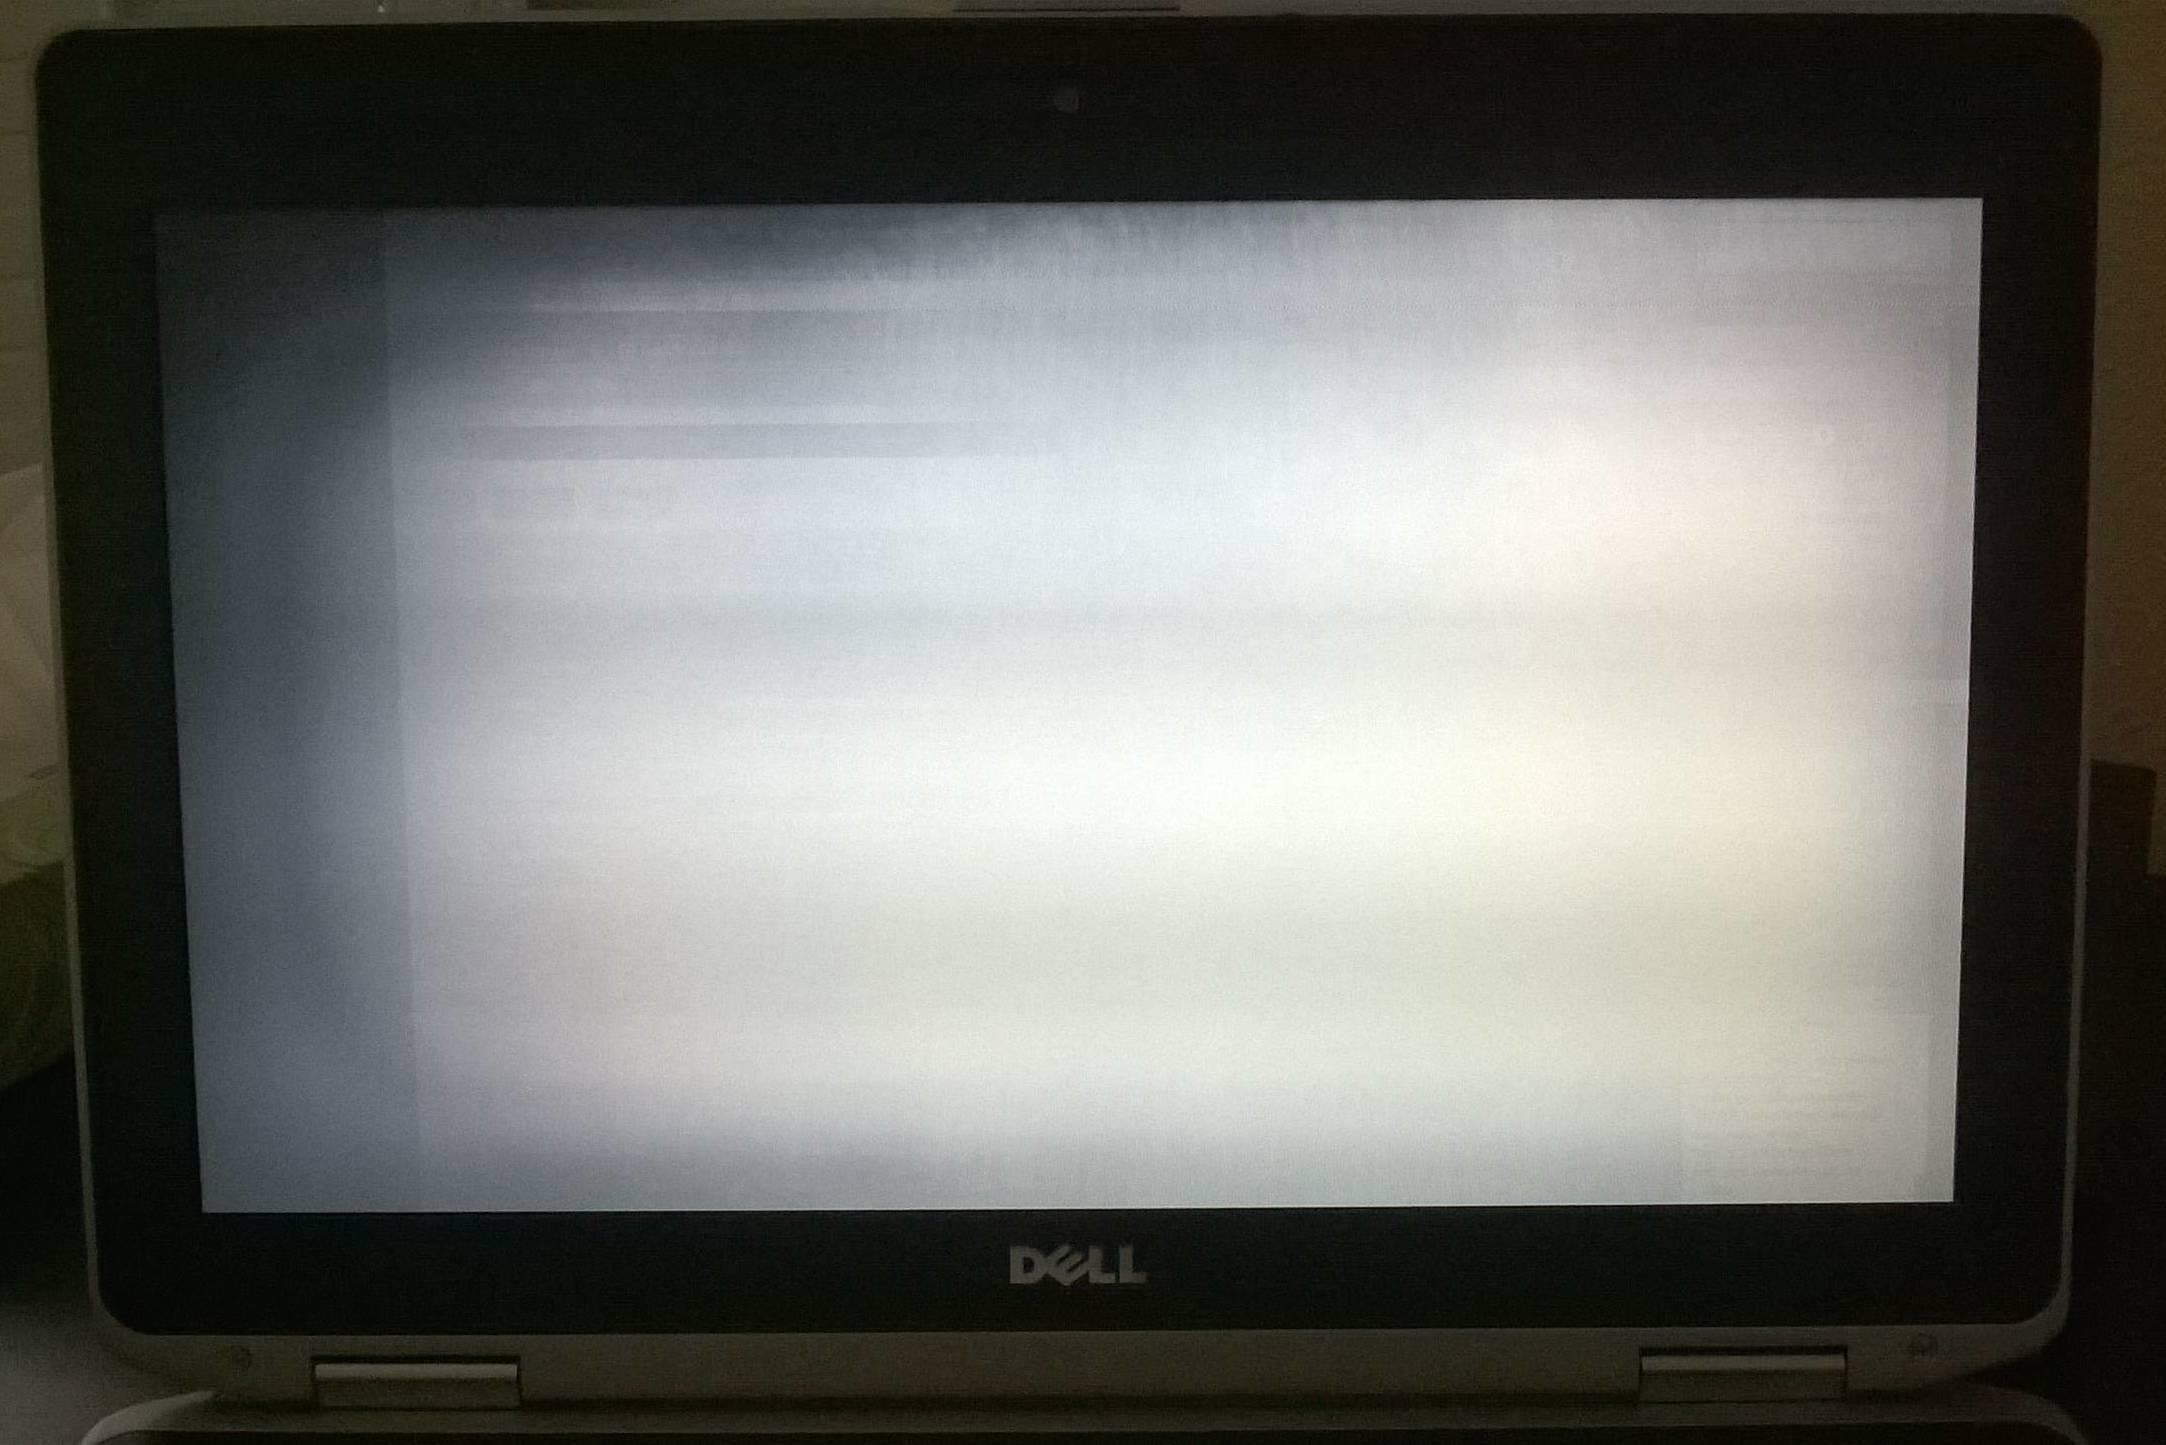 Strange LCD Failure Mode On A Dell Latitude E6430 Laptop